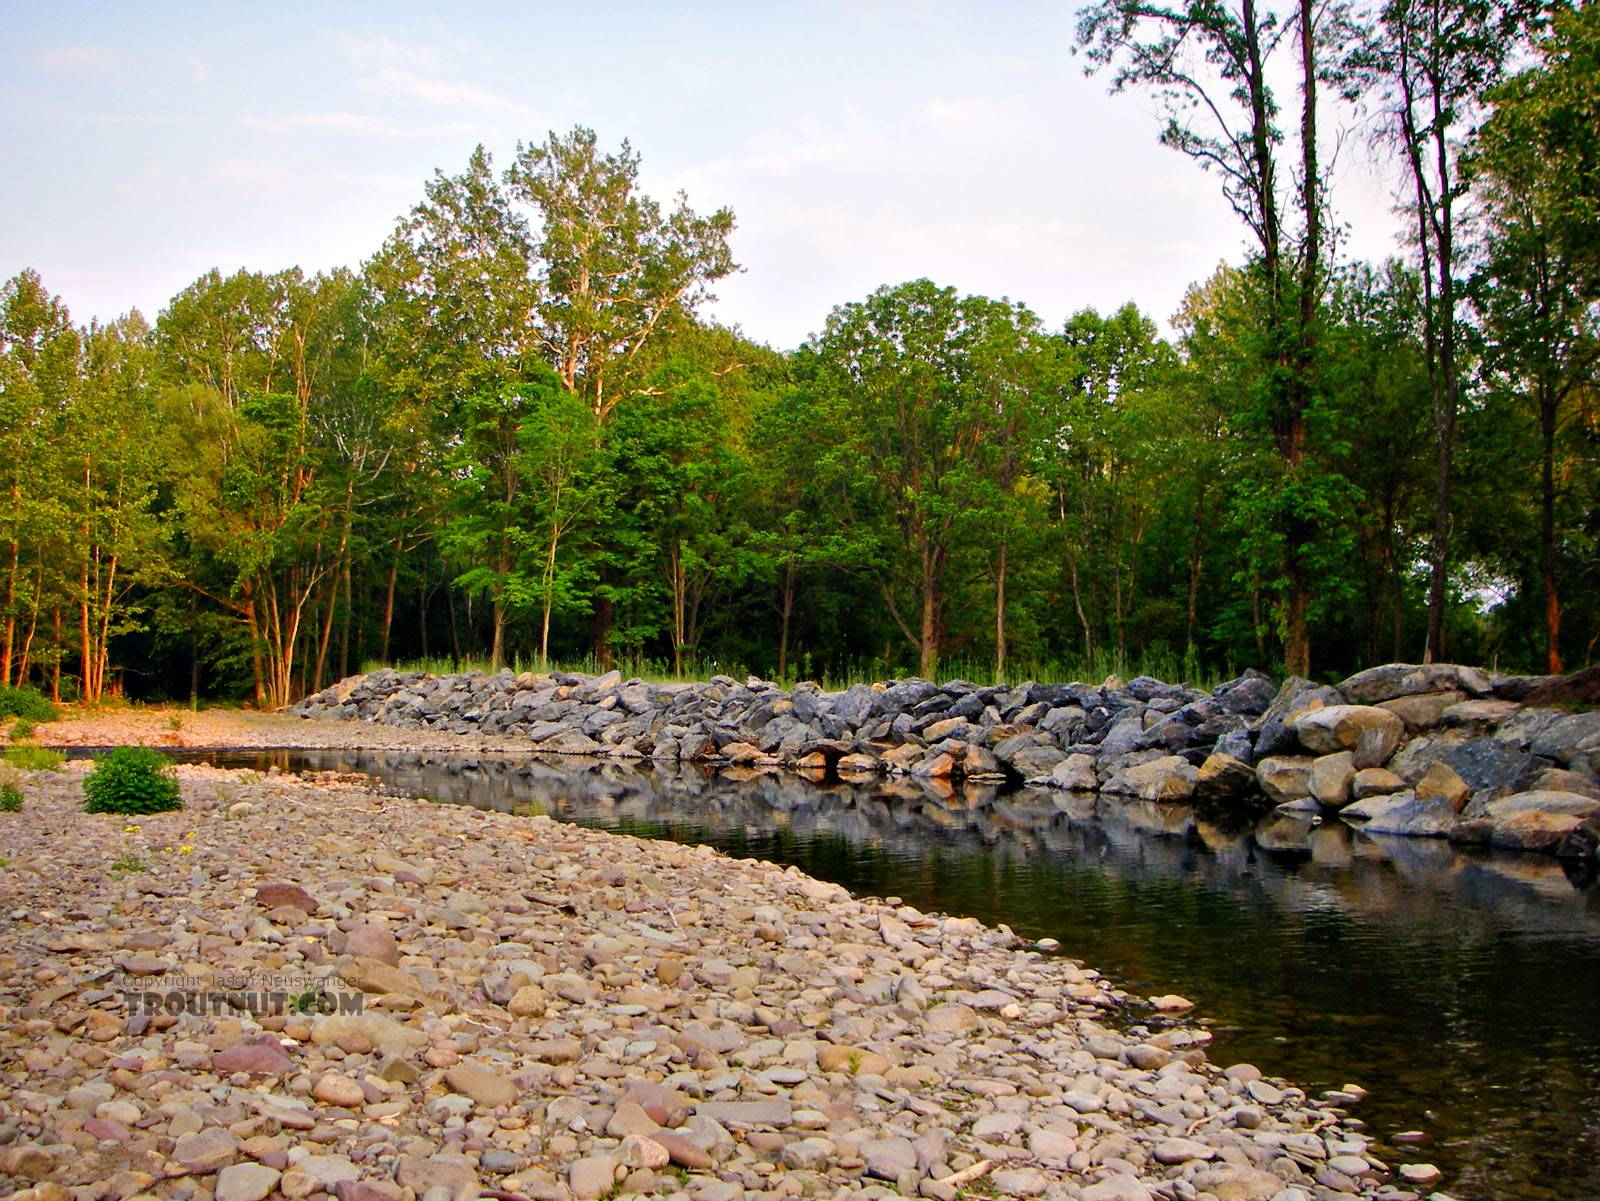 From Brodhead Creek in Pennsylvania.